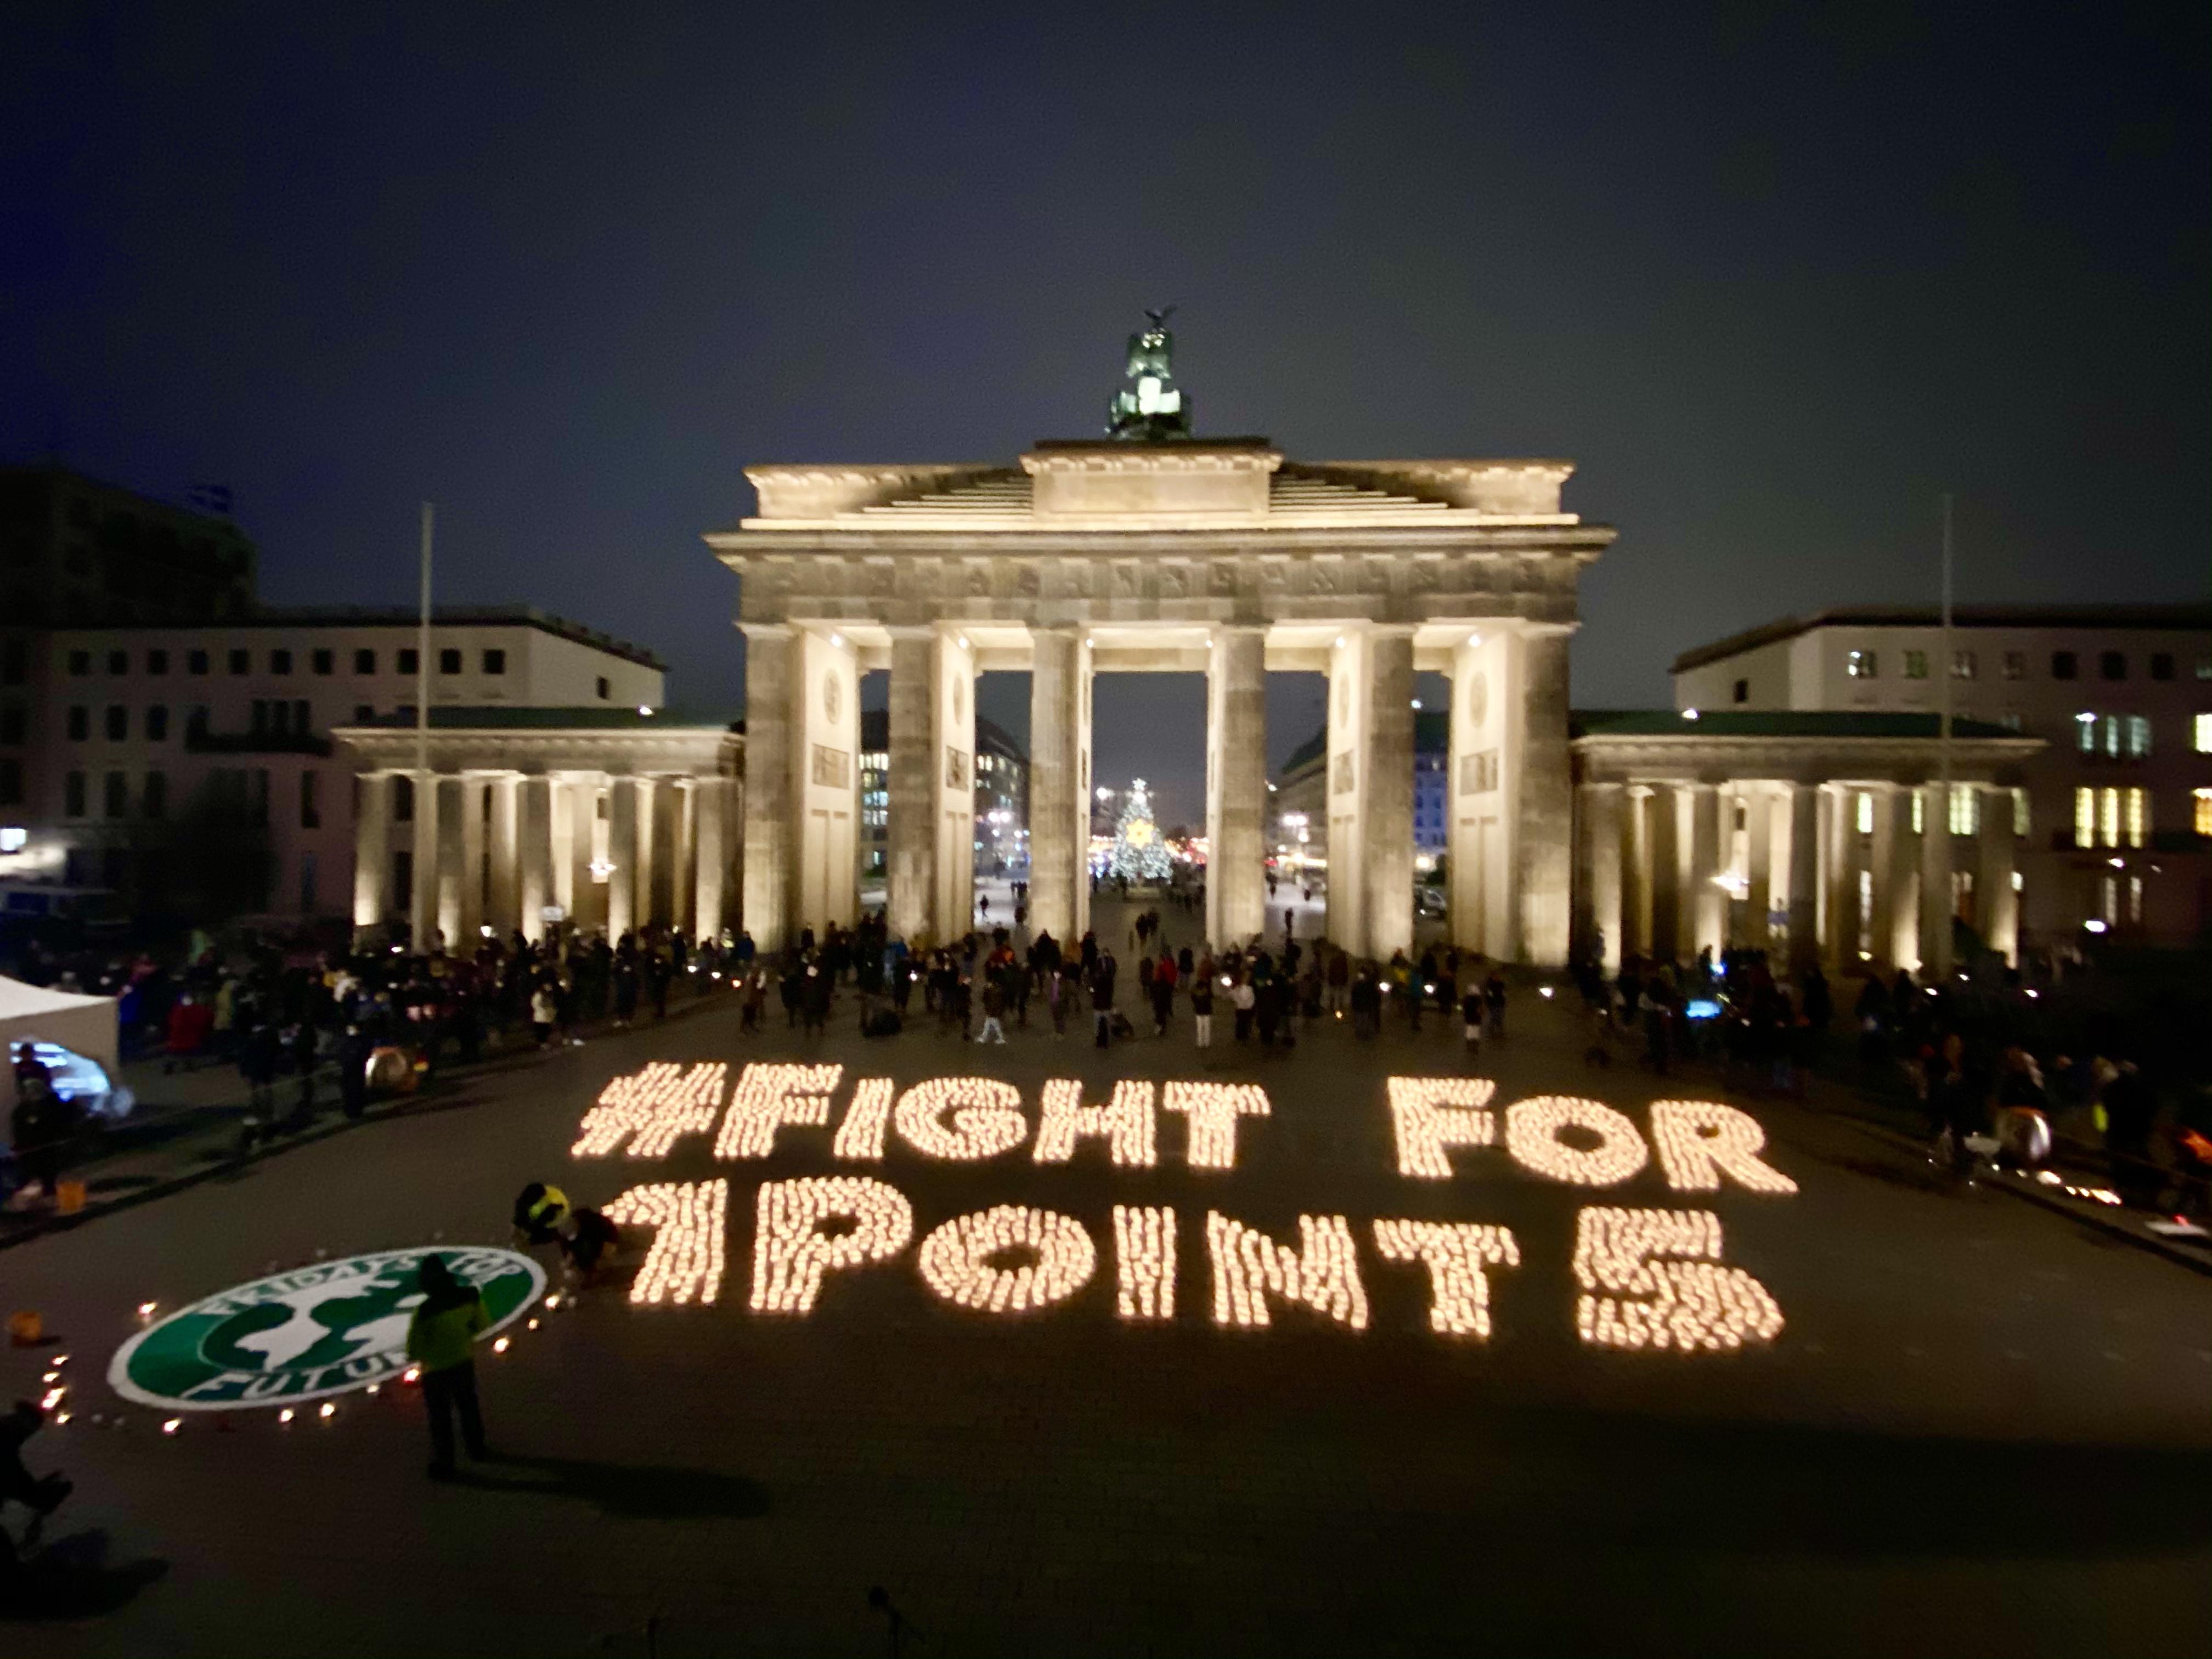 FightFor1Point5 - Berlin